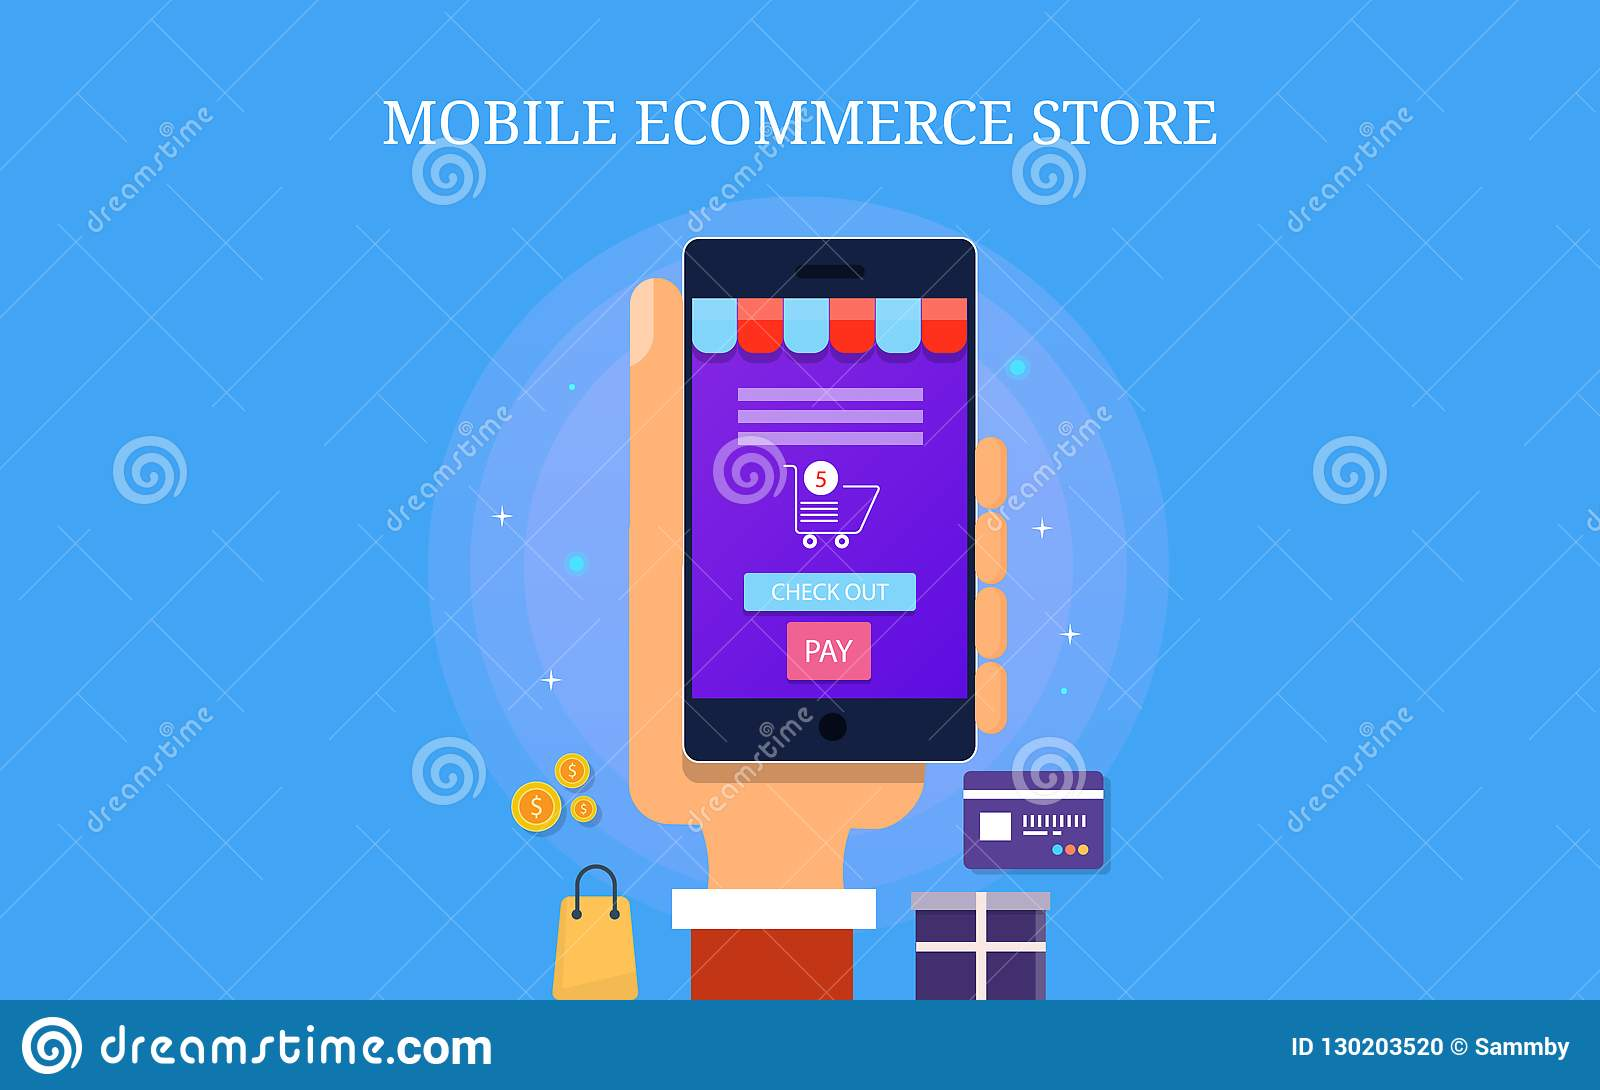 Mobile Ecommerce Store Mobile App For Ecommerce Website Digital Marketing Concept Flat Design Vector Banner Stock Vector Illustration Of Business Ecommerce 130203520